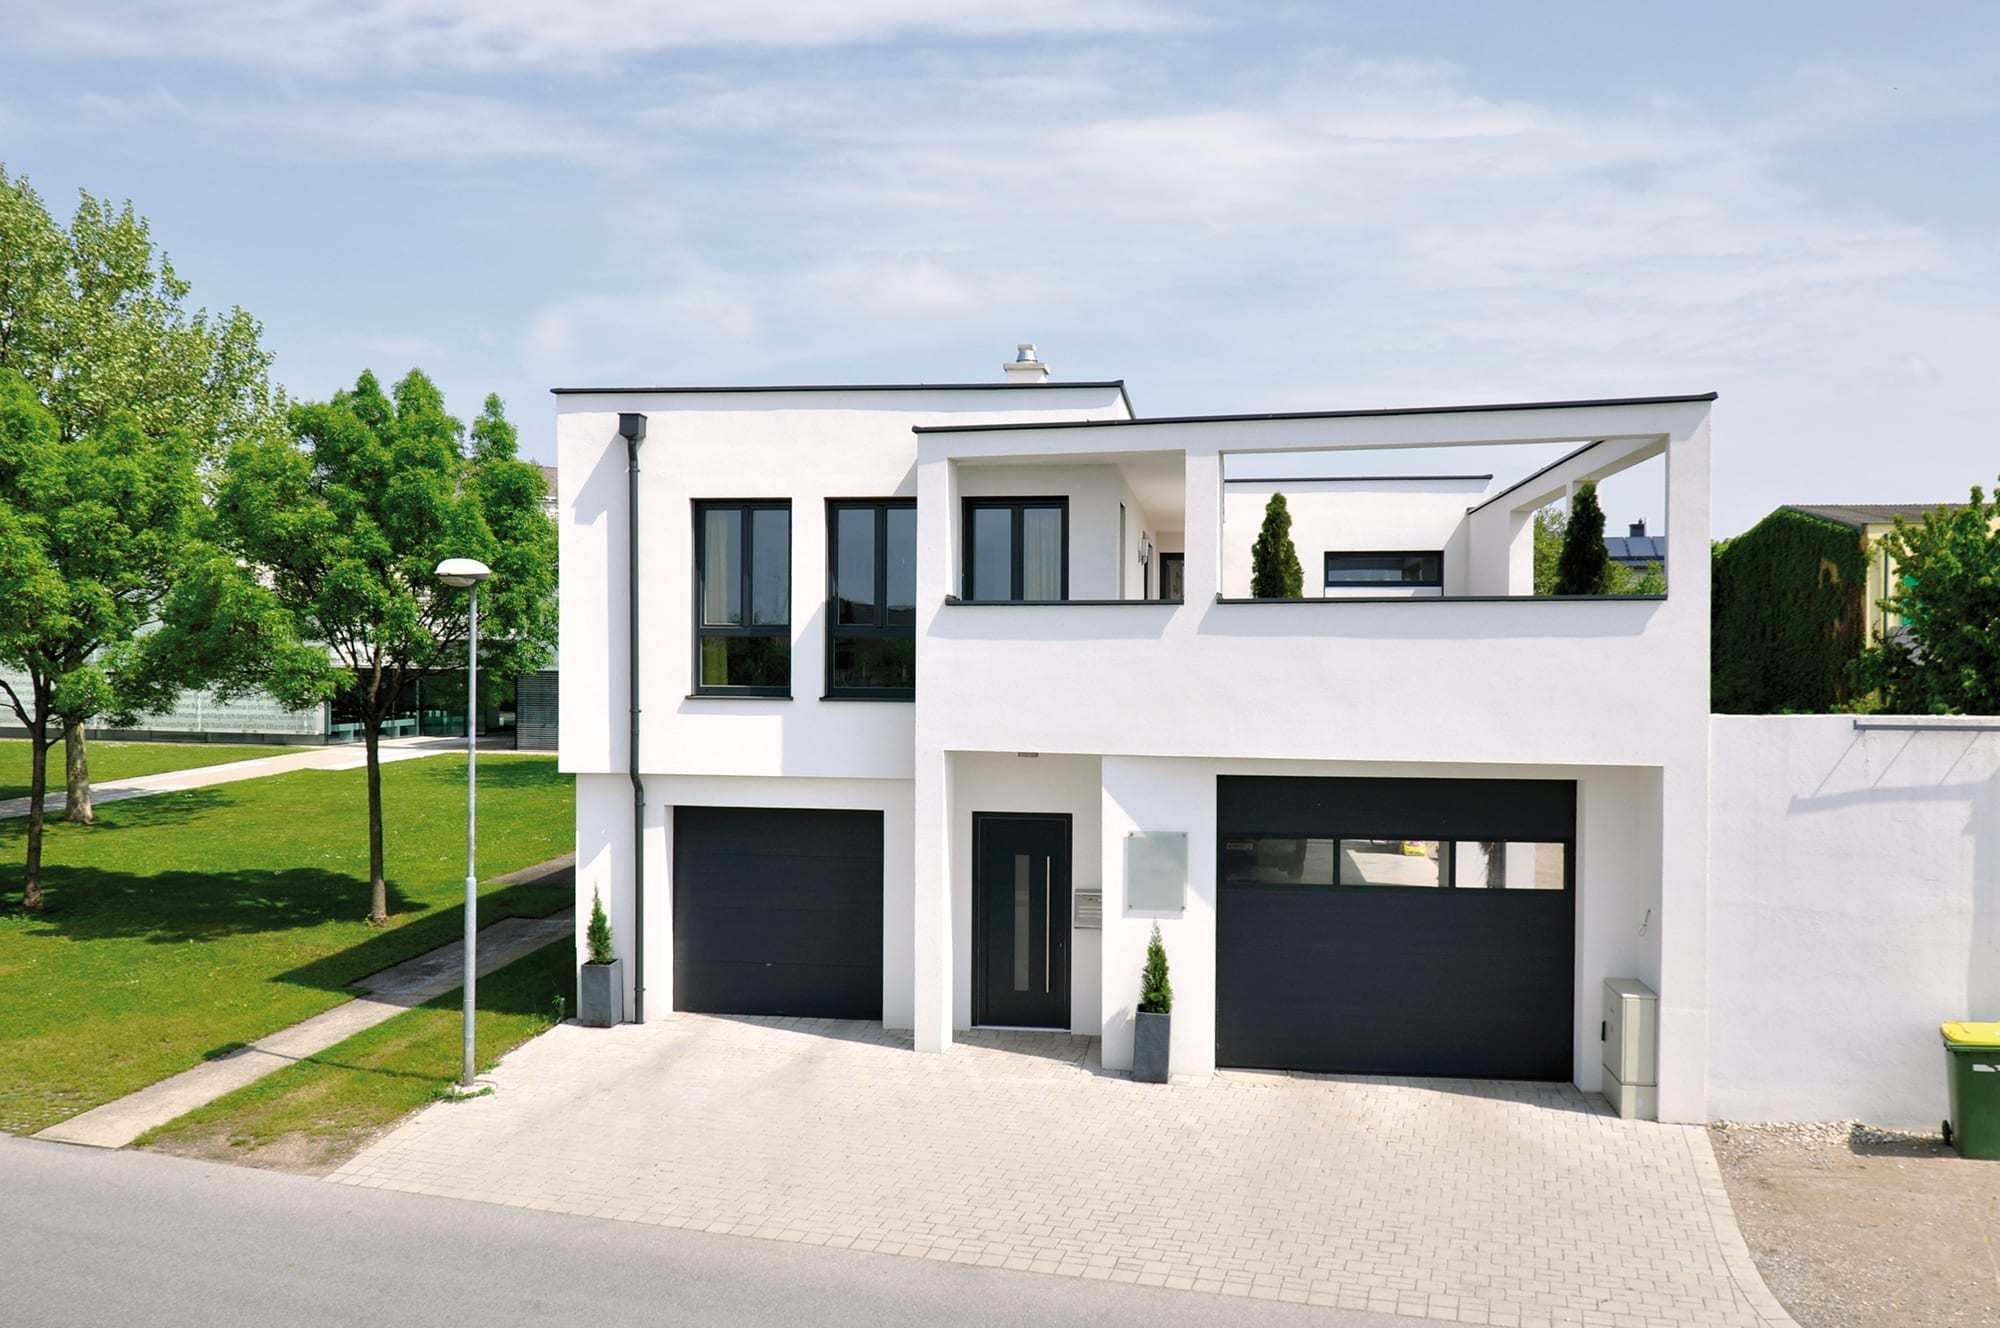 Einfamilienh user trocal for Einfamilienhaus modern flachdach